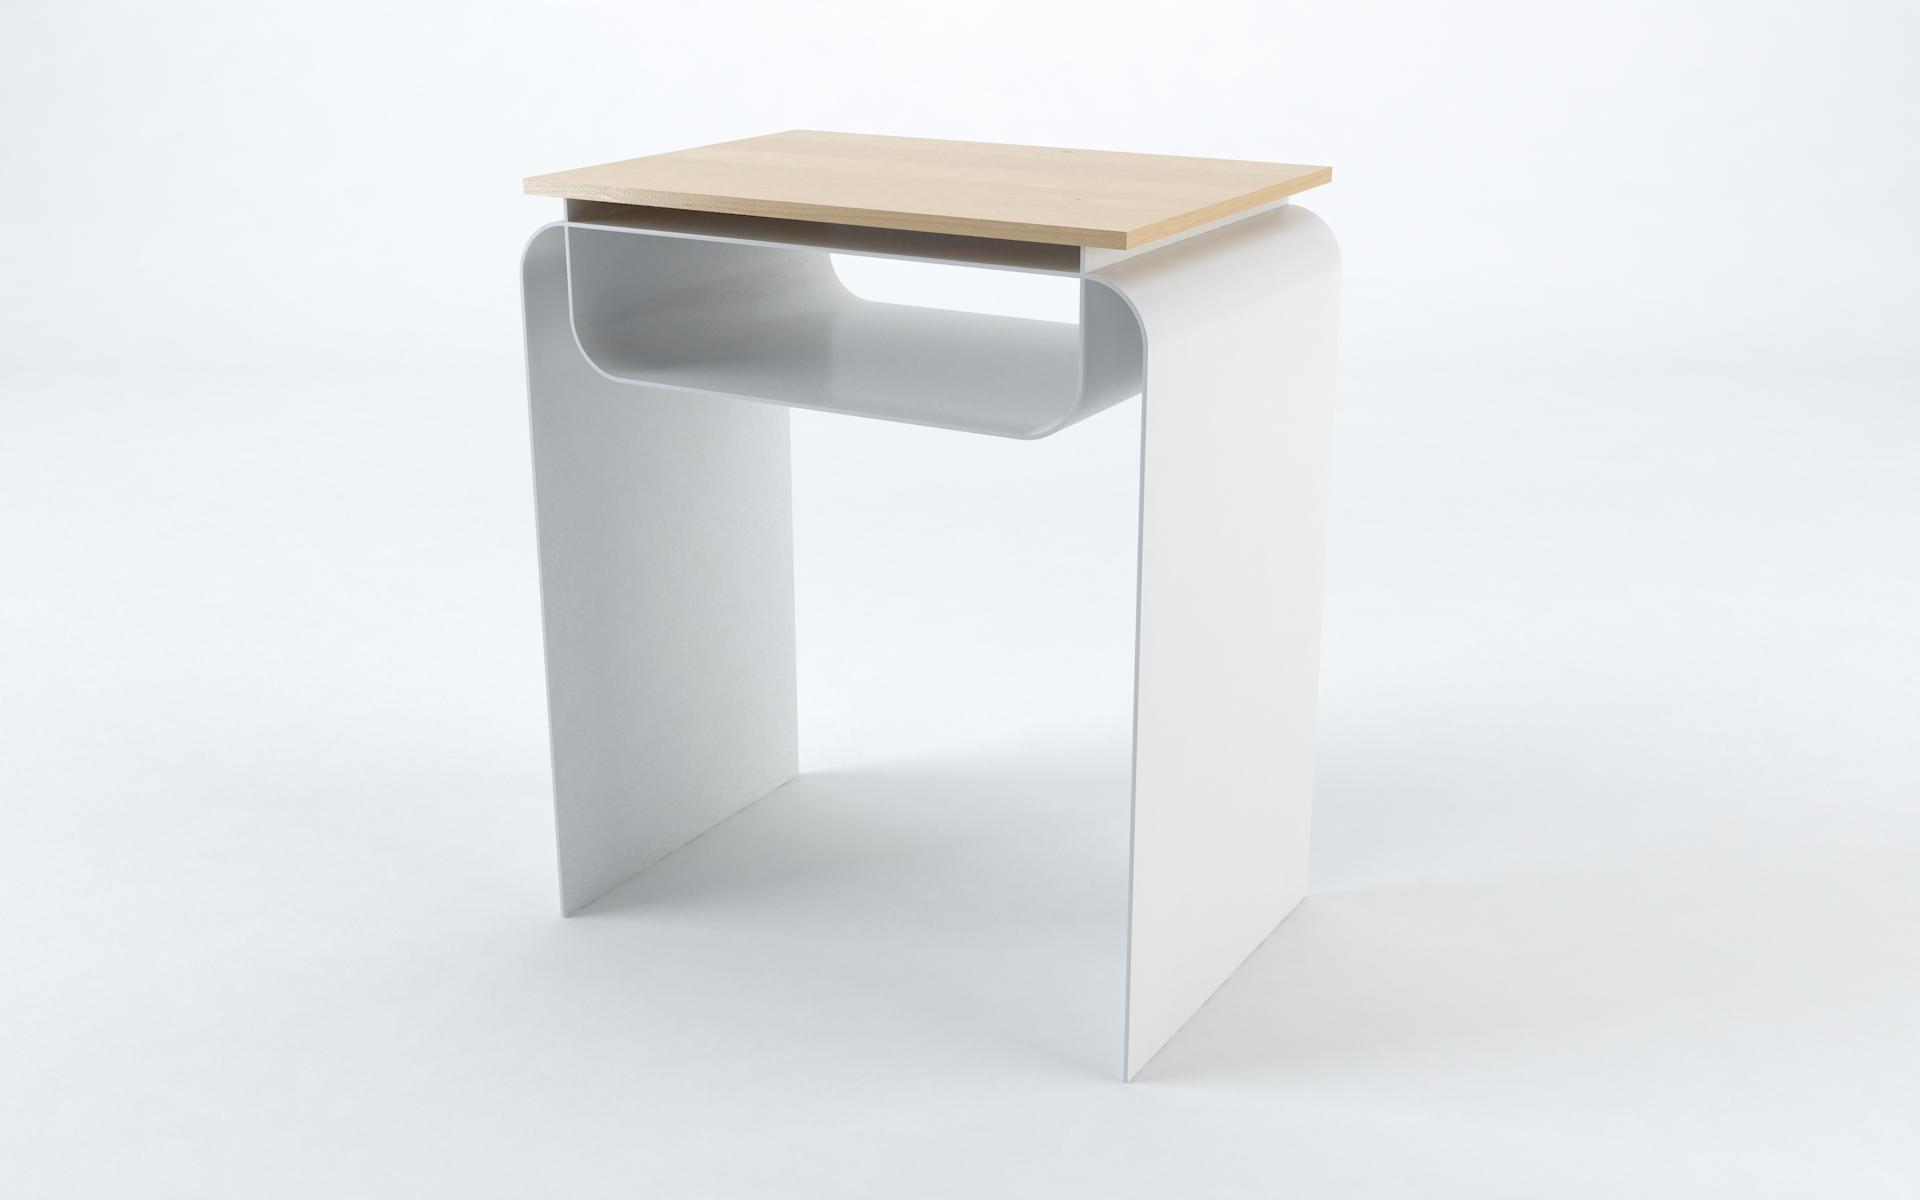 Table de chevet Benjamin Rousse design studio2